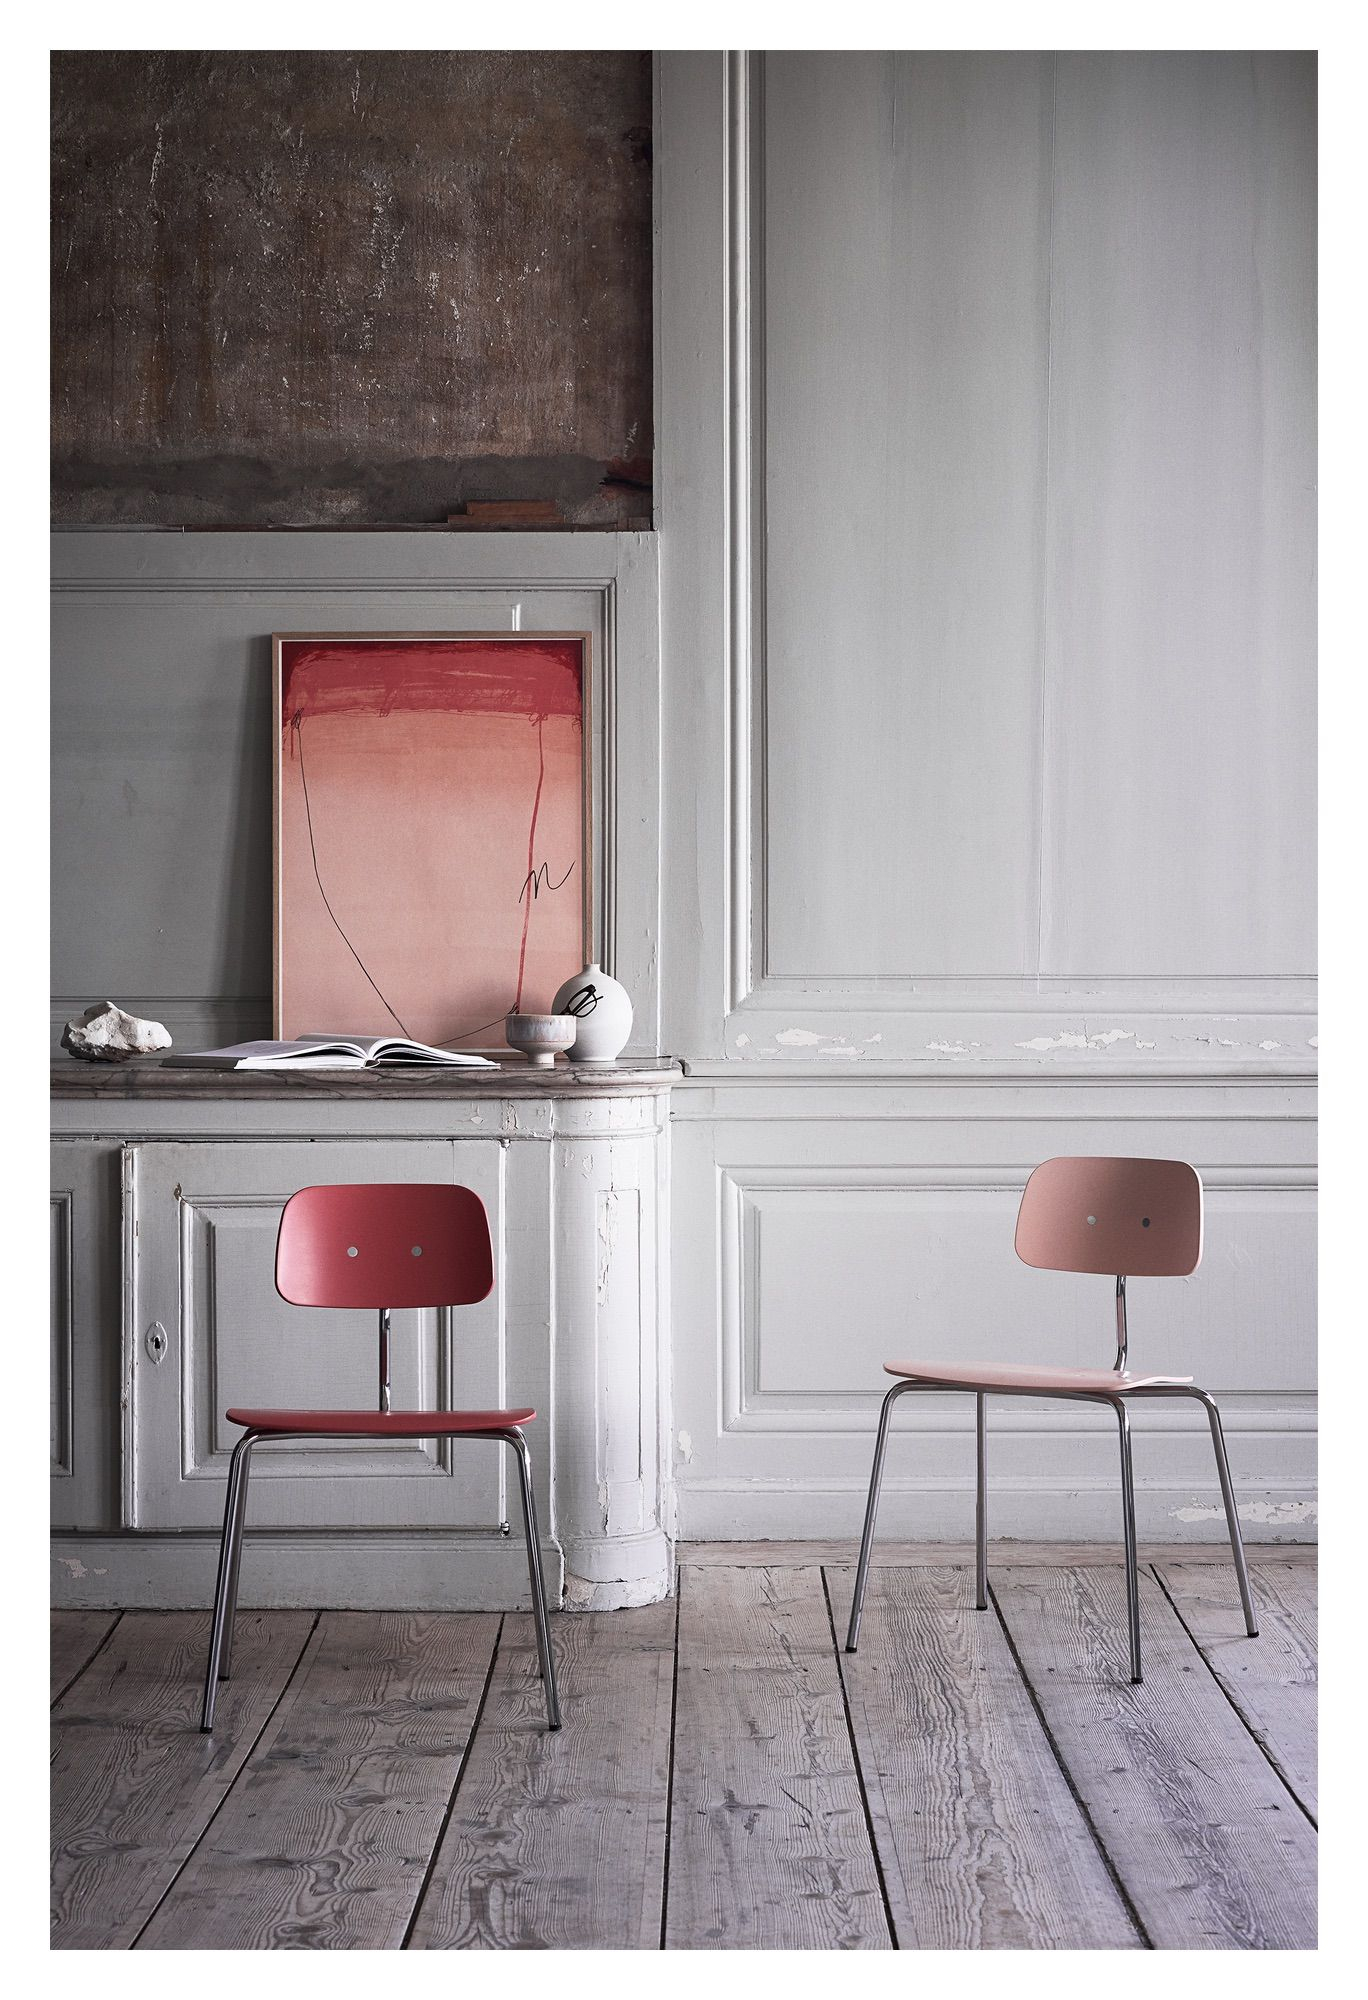 Engelbrechts KEVI 2060 Spisebordsstol, Deep Peach/Krom